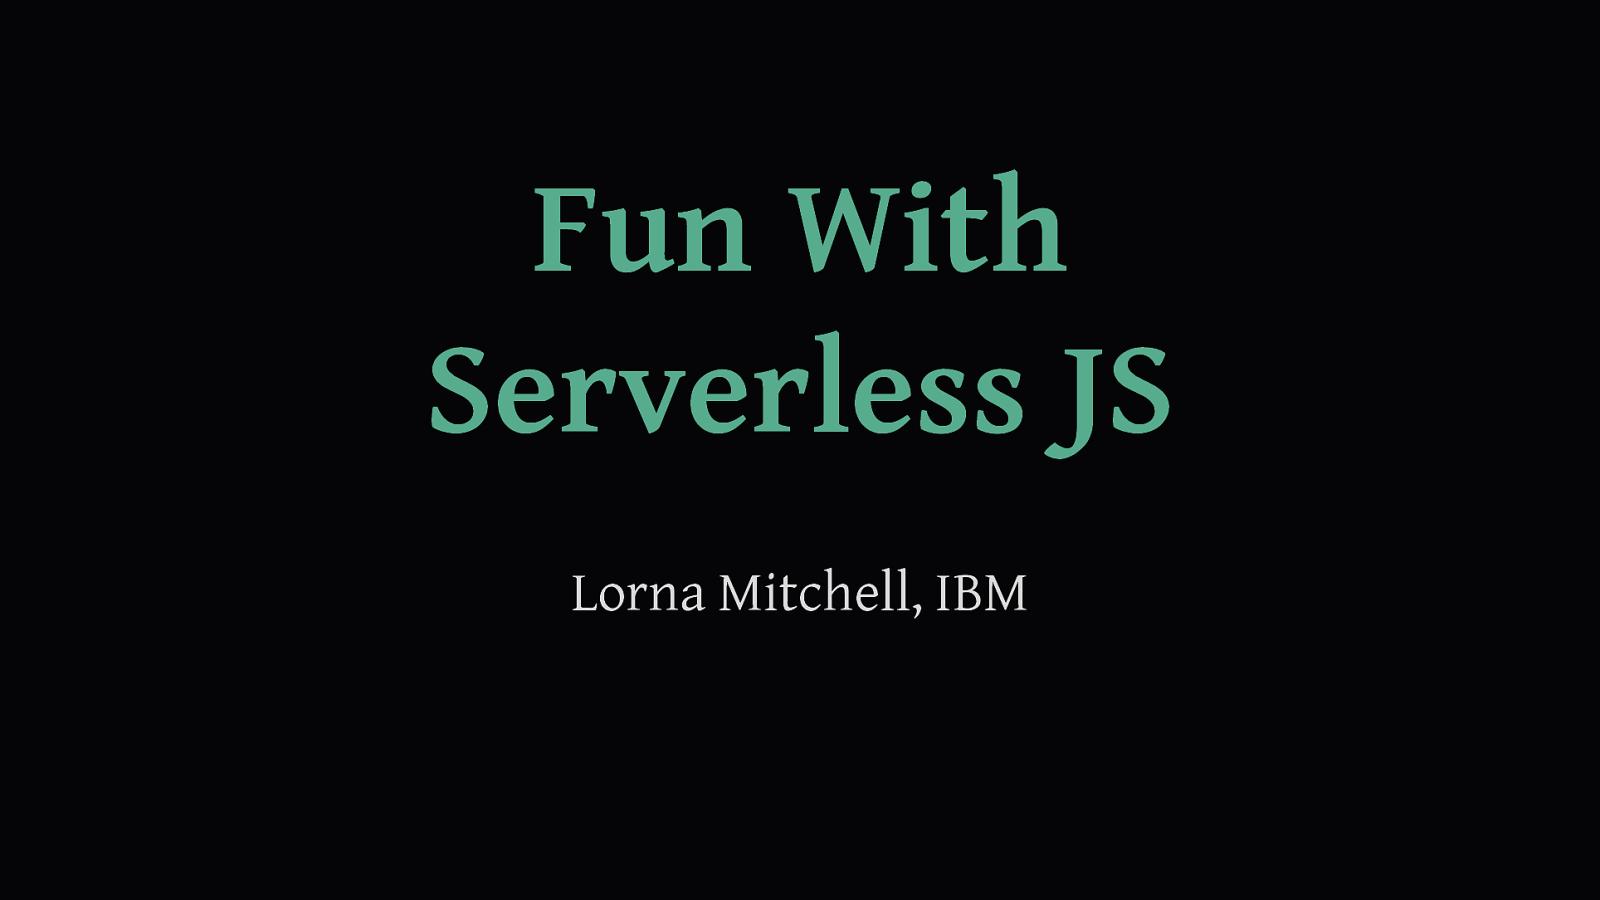 Fun With ServerlessJS